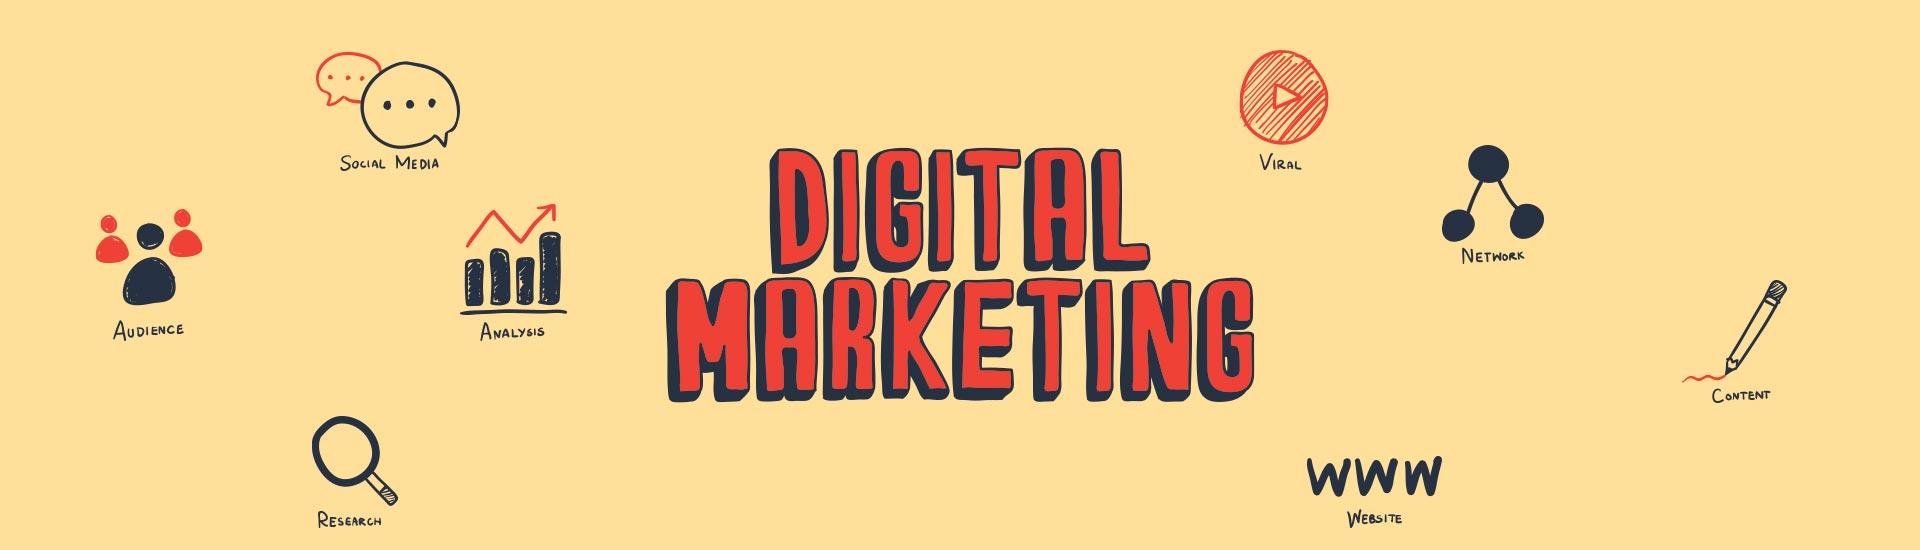 A-Step-by-Step-Guide-to-Digital-Marketing.jpg